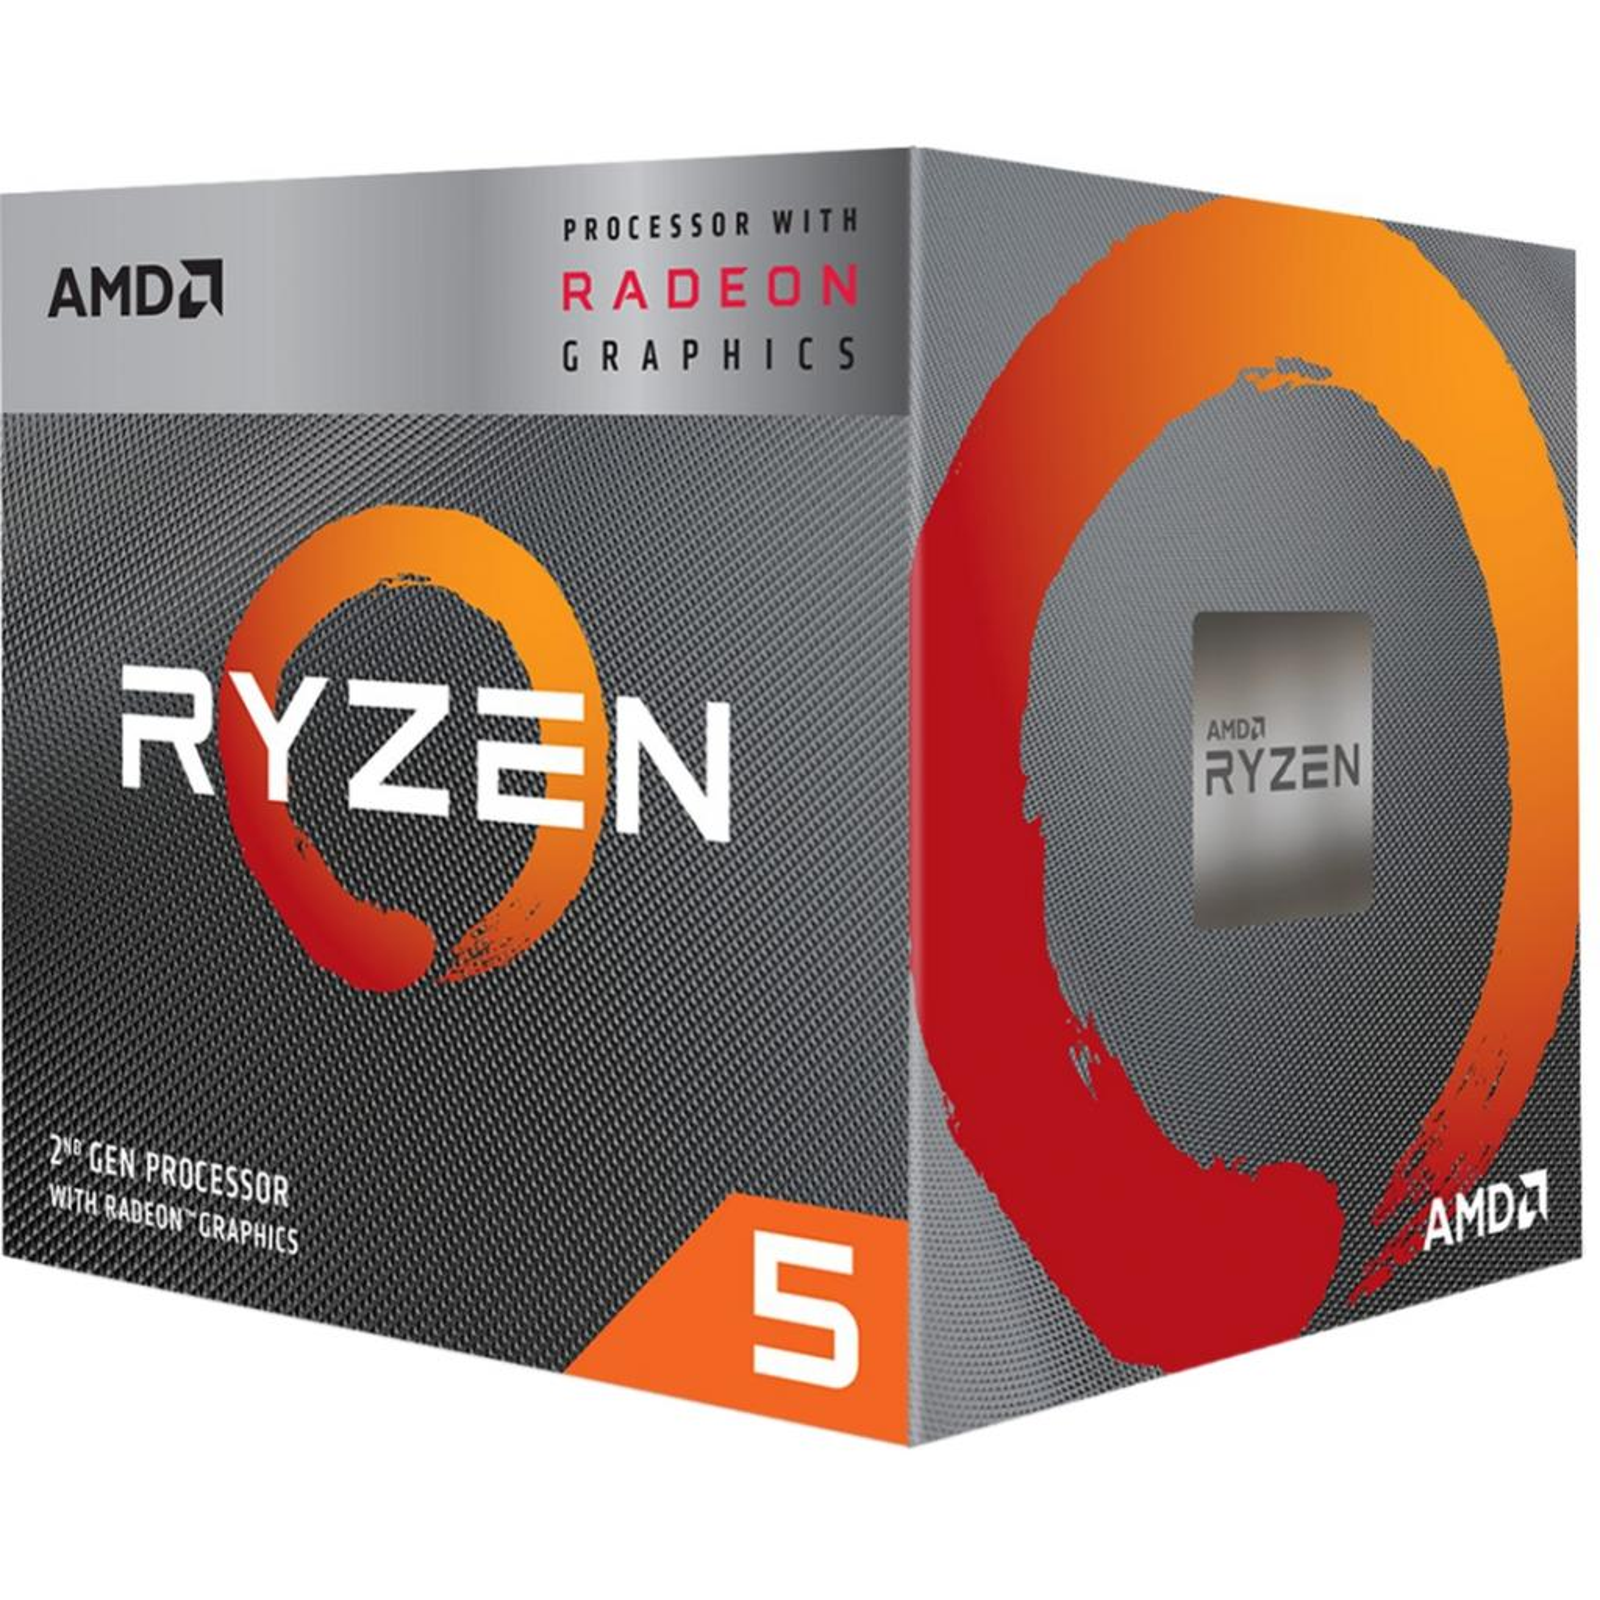 Процесор AMD Ryzen 5 3400G (YD3400C5FHMPK) зображення 2